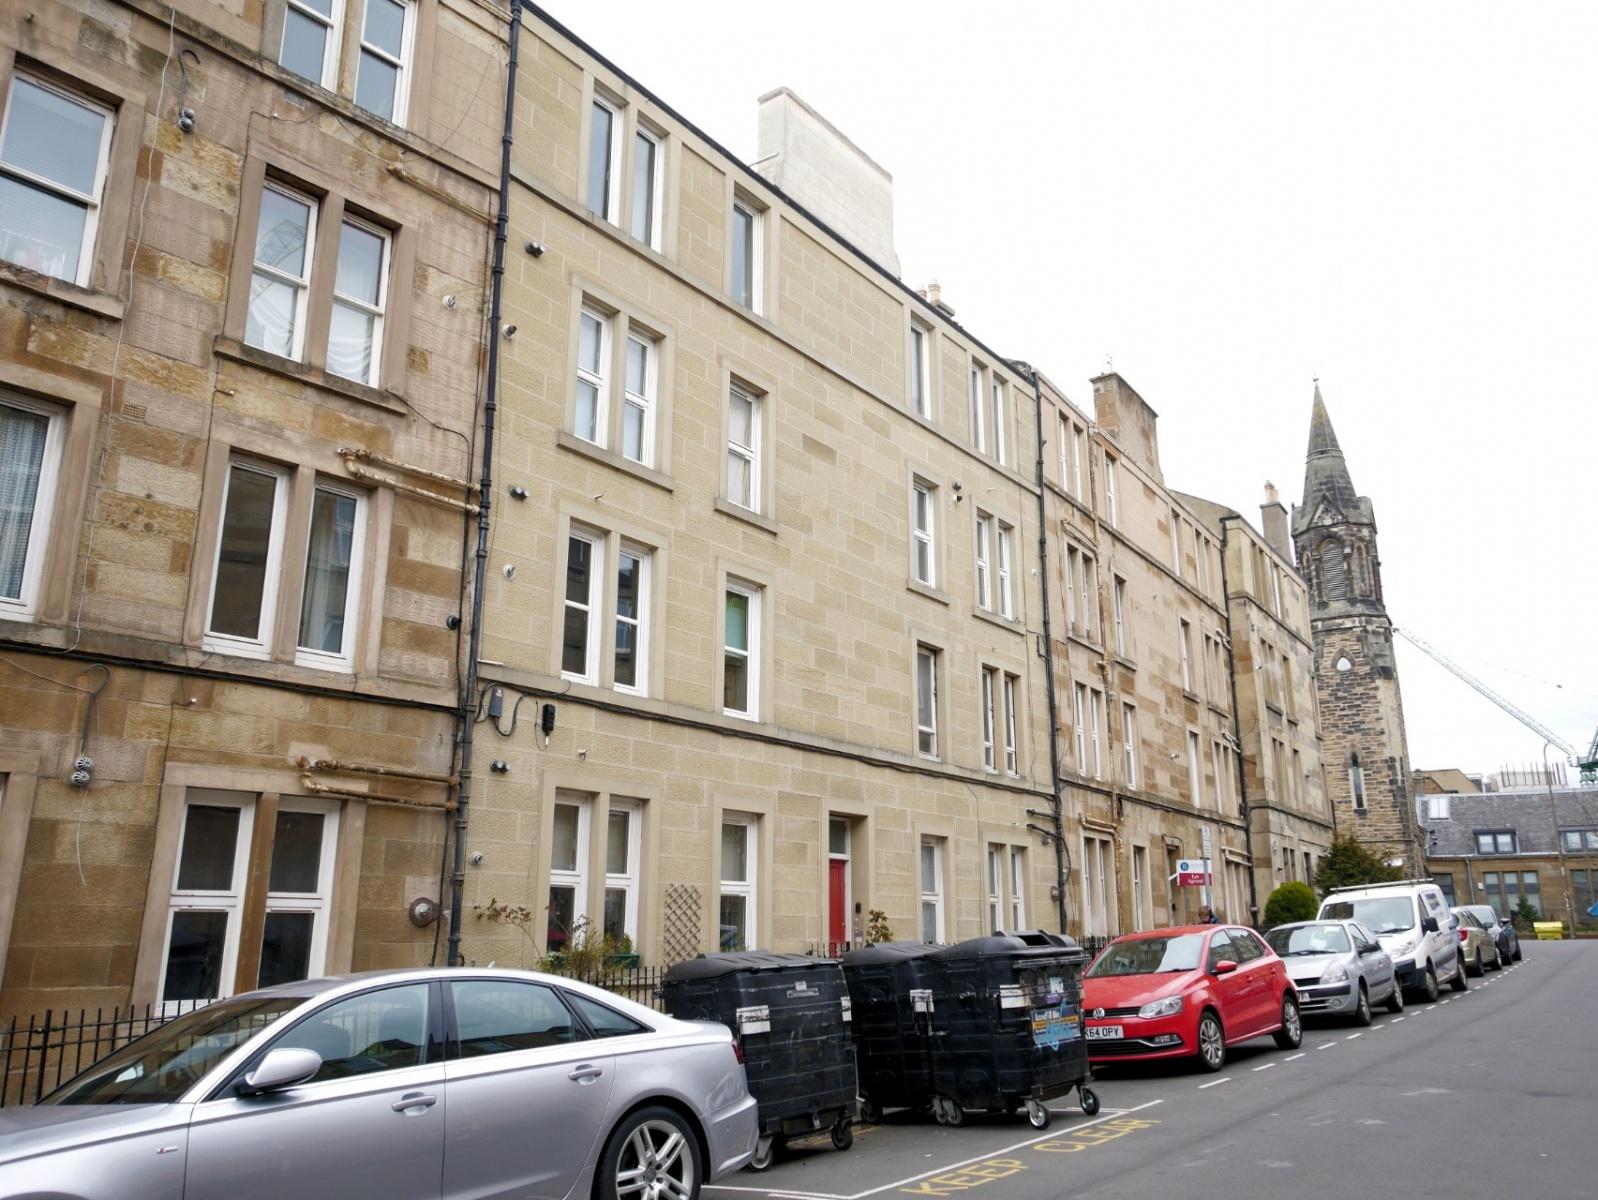 P44: Caledonian Crescent, Haymarket, Edinburgh